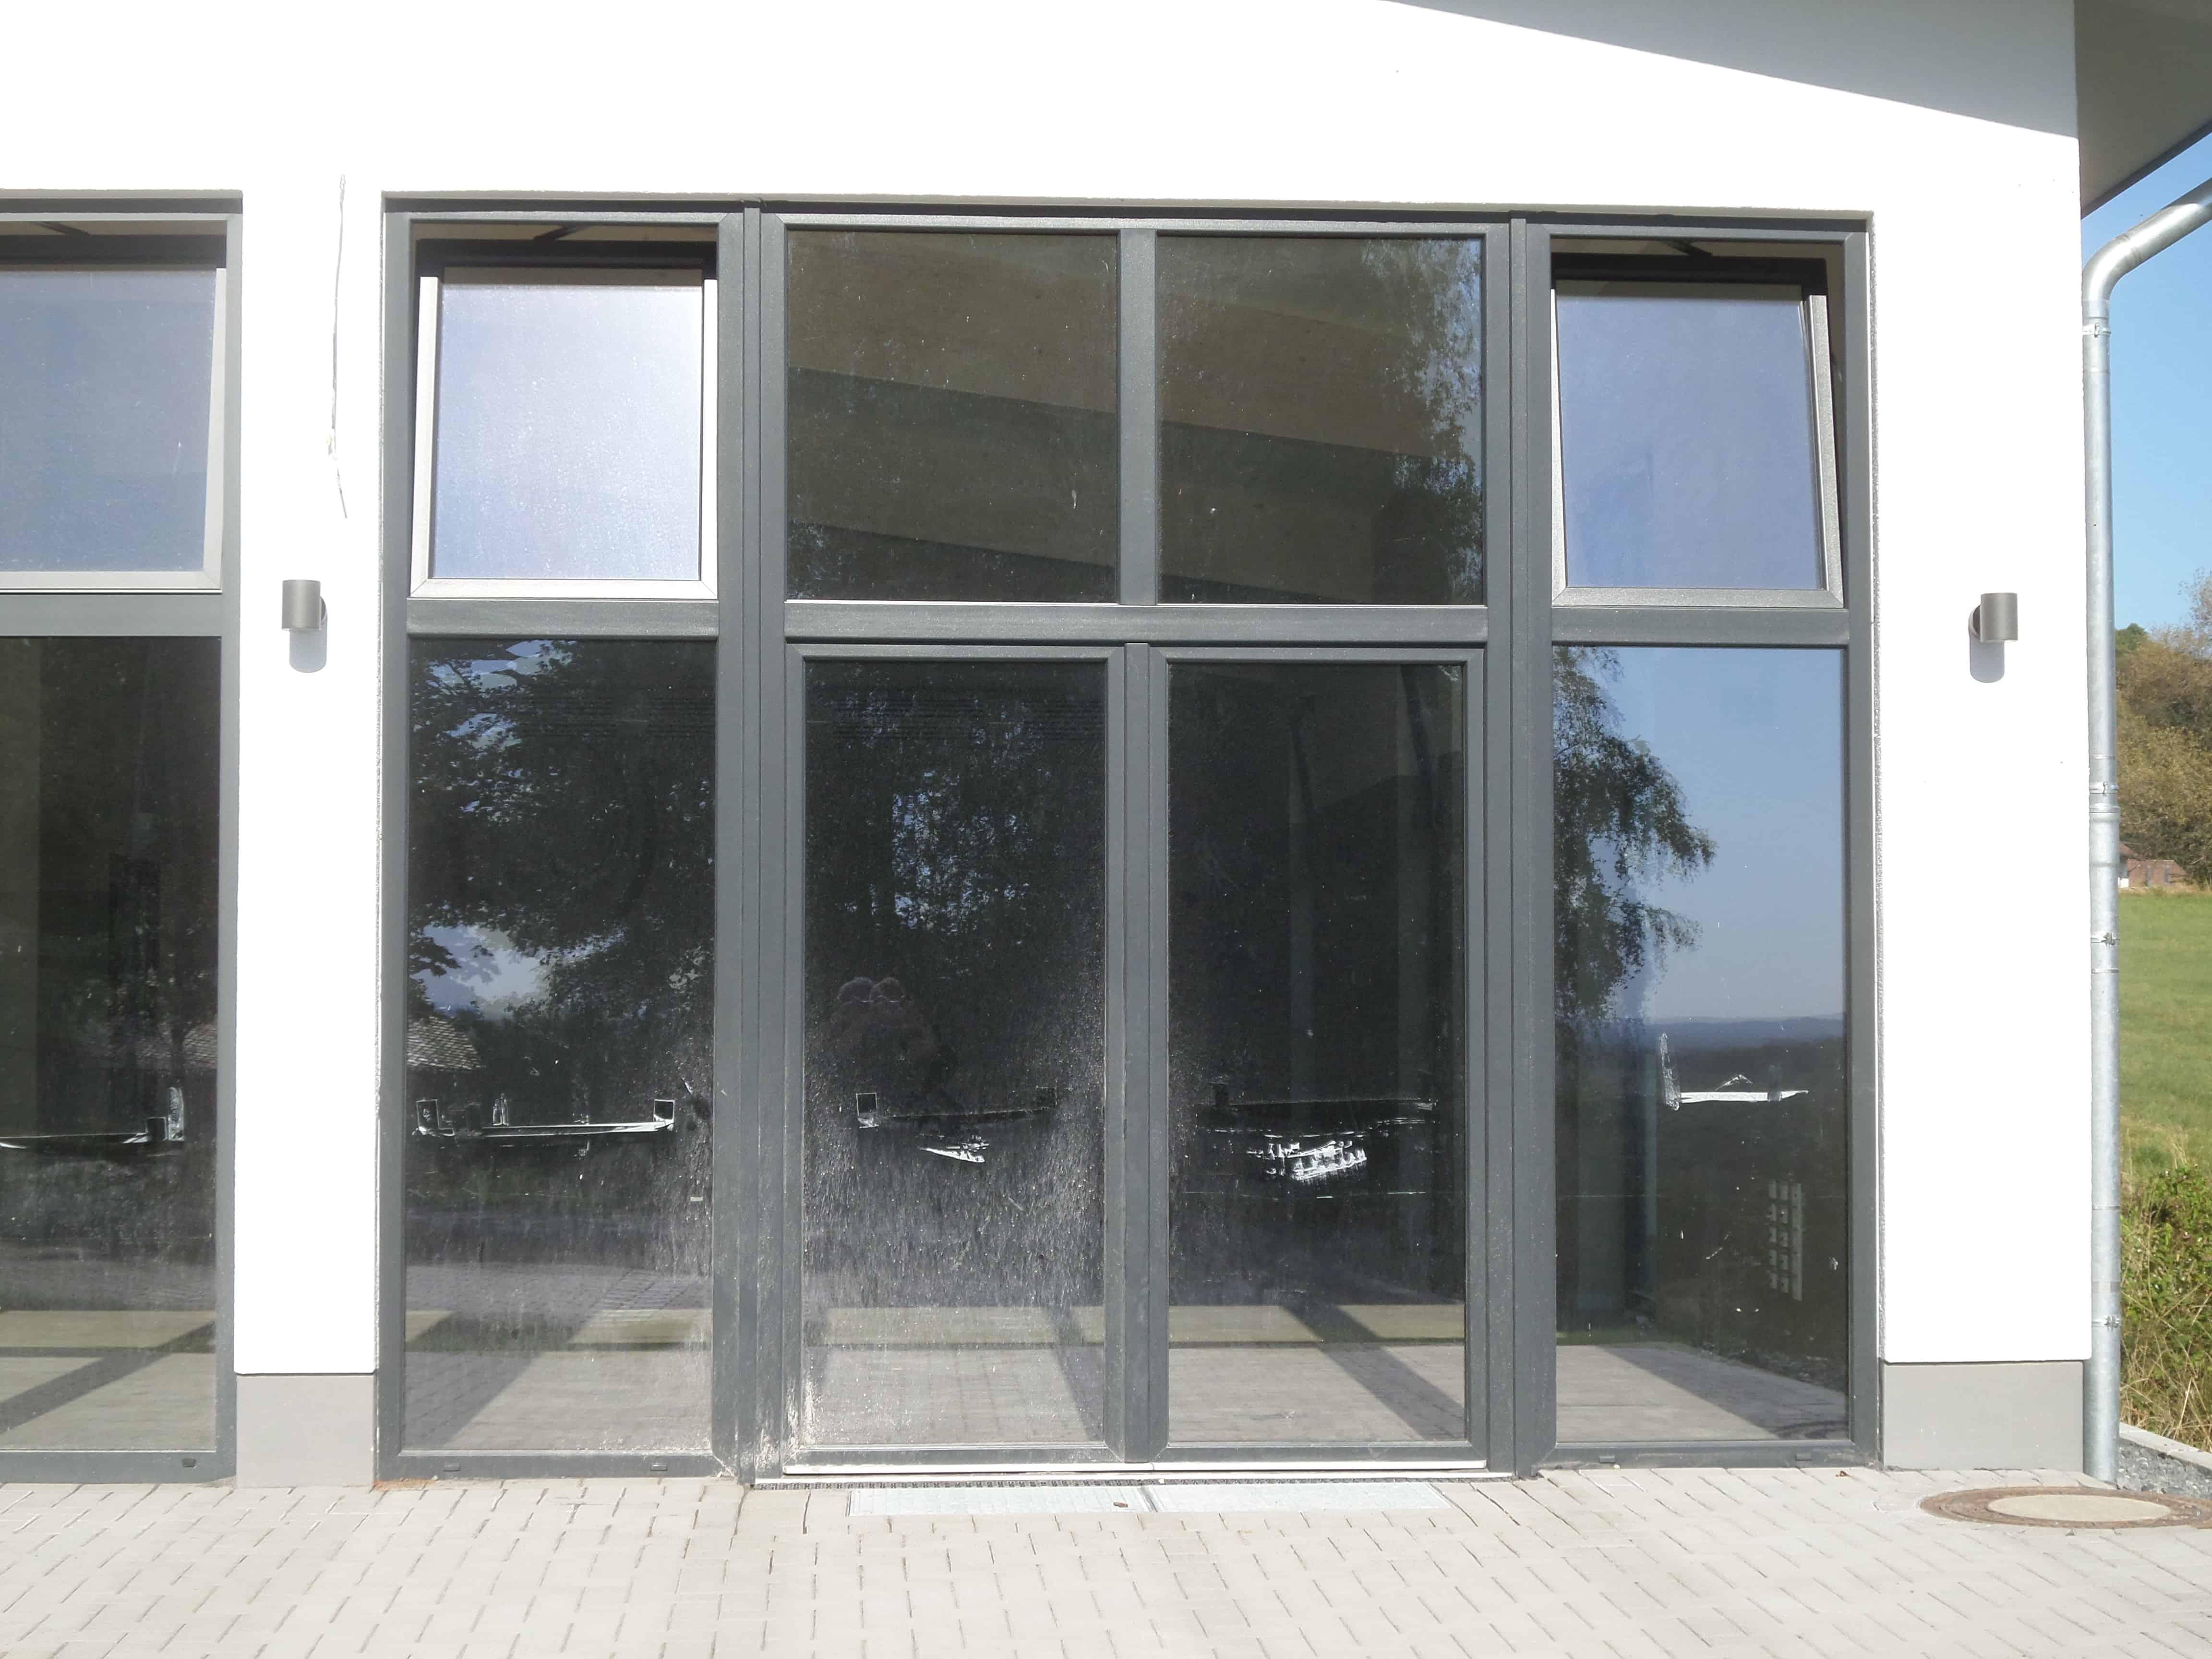 Fenster-Tür-Element, Alu eloxiert, Sonderanfertigung